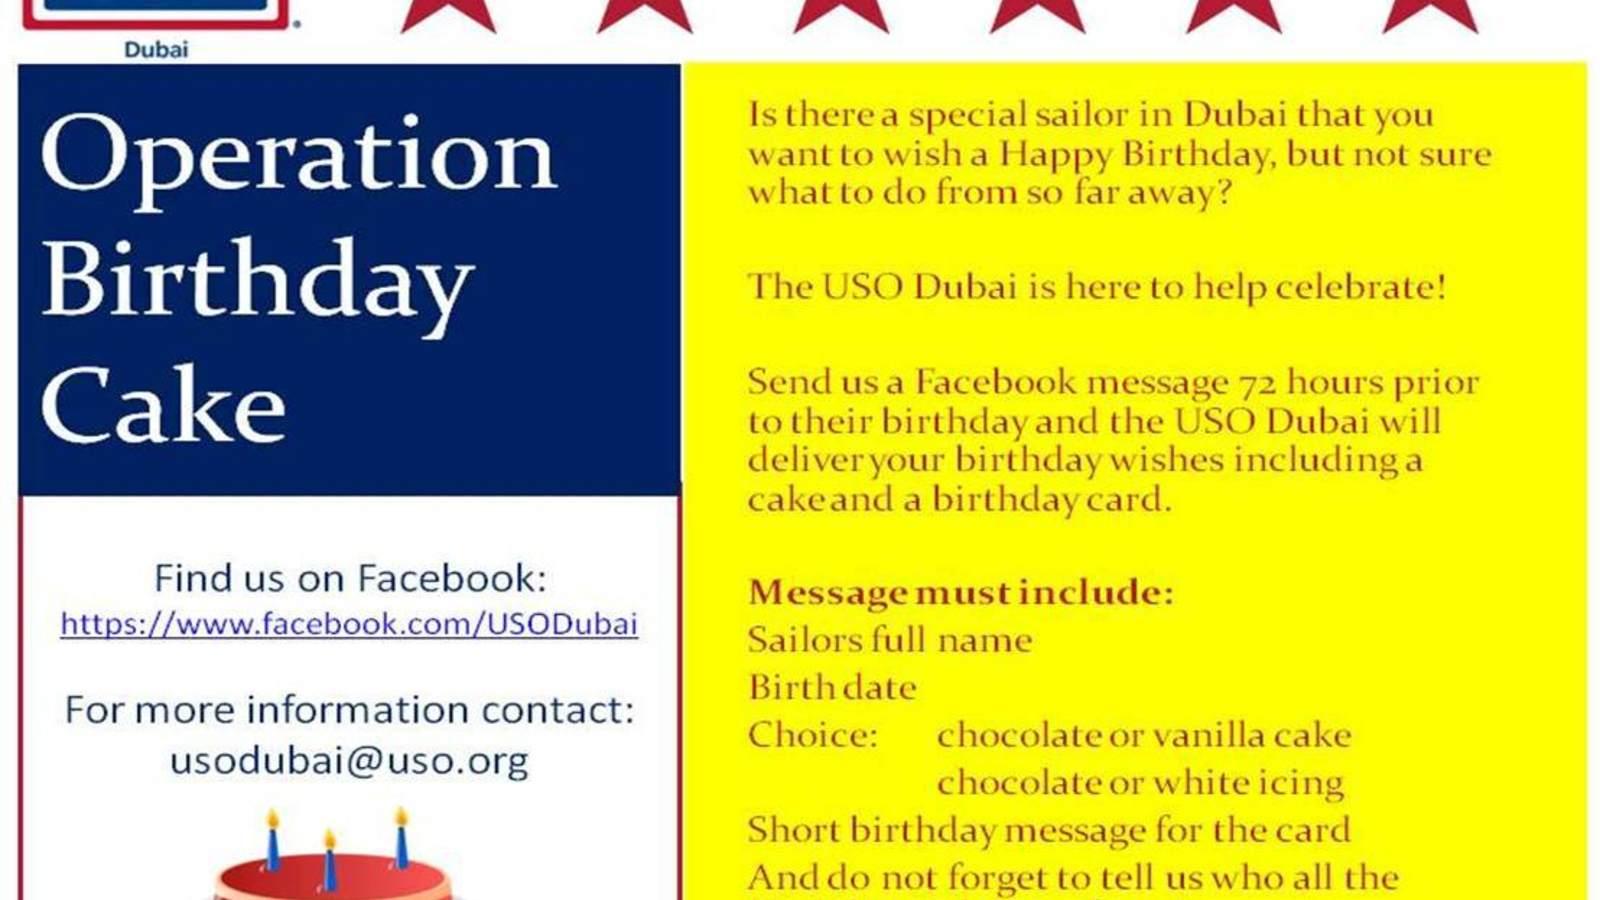 Operation Birthday Cake O USO Dubai And Abu Dhabi